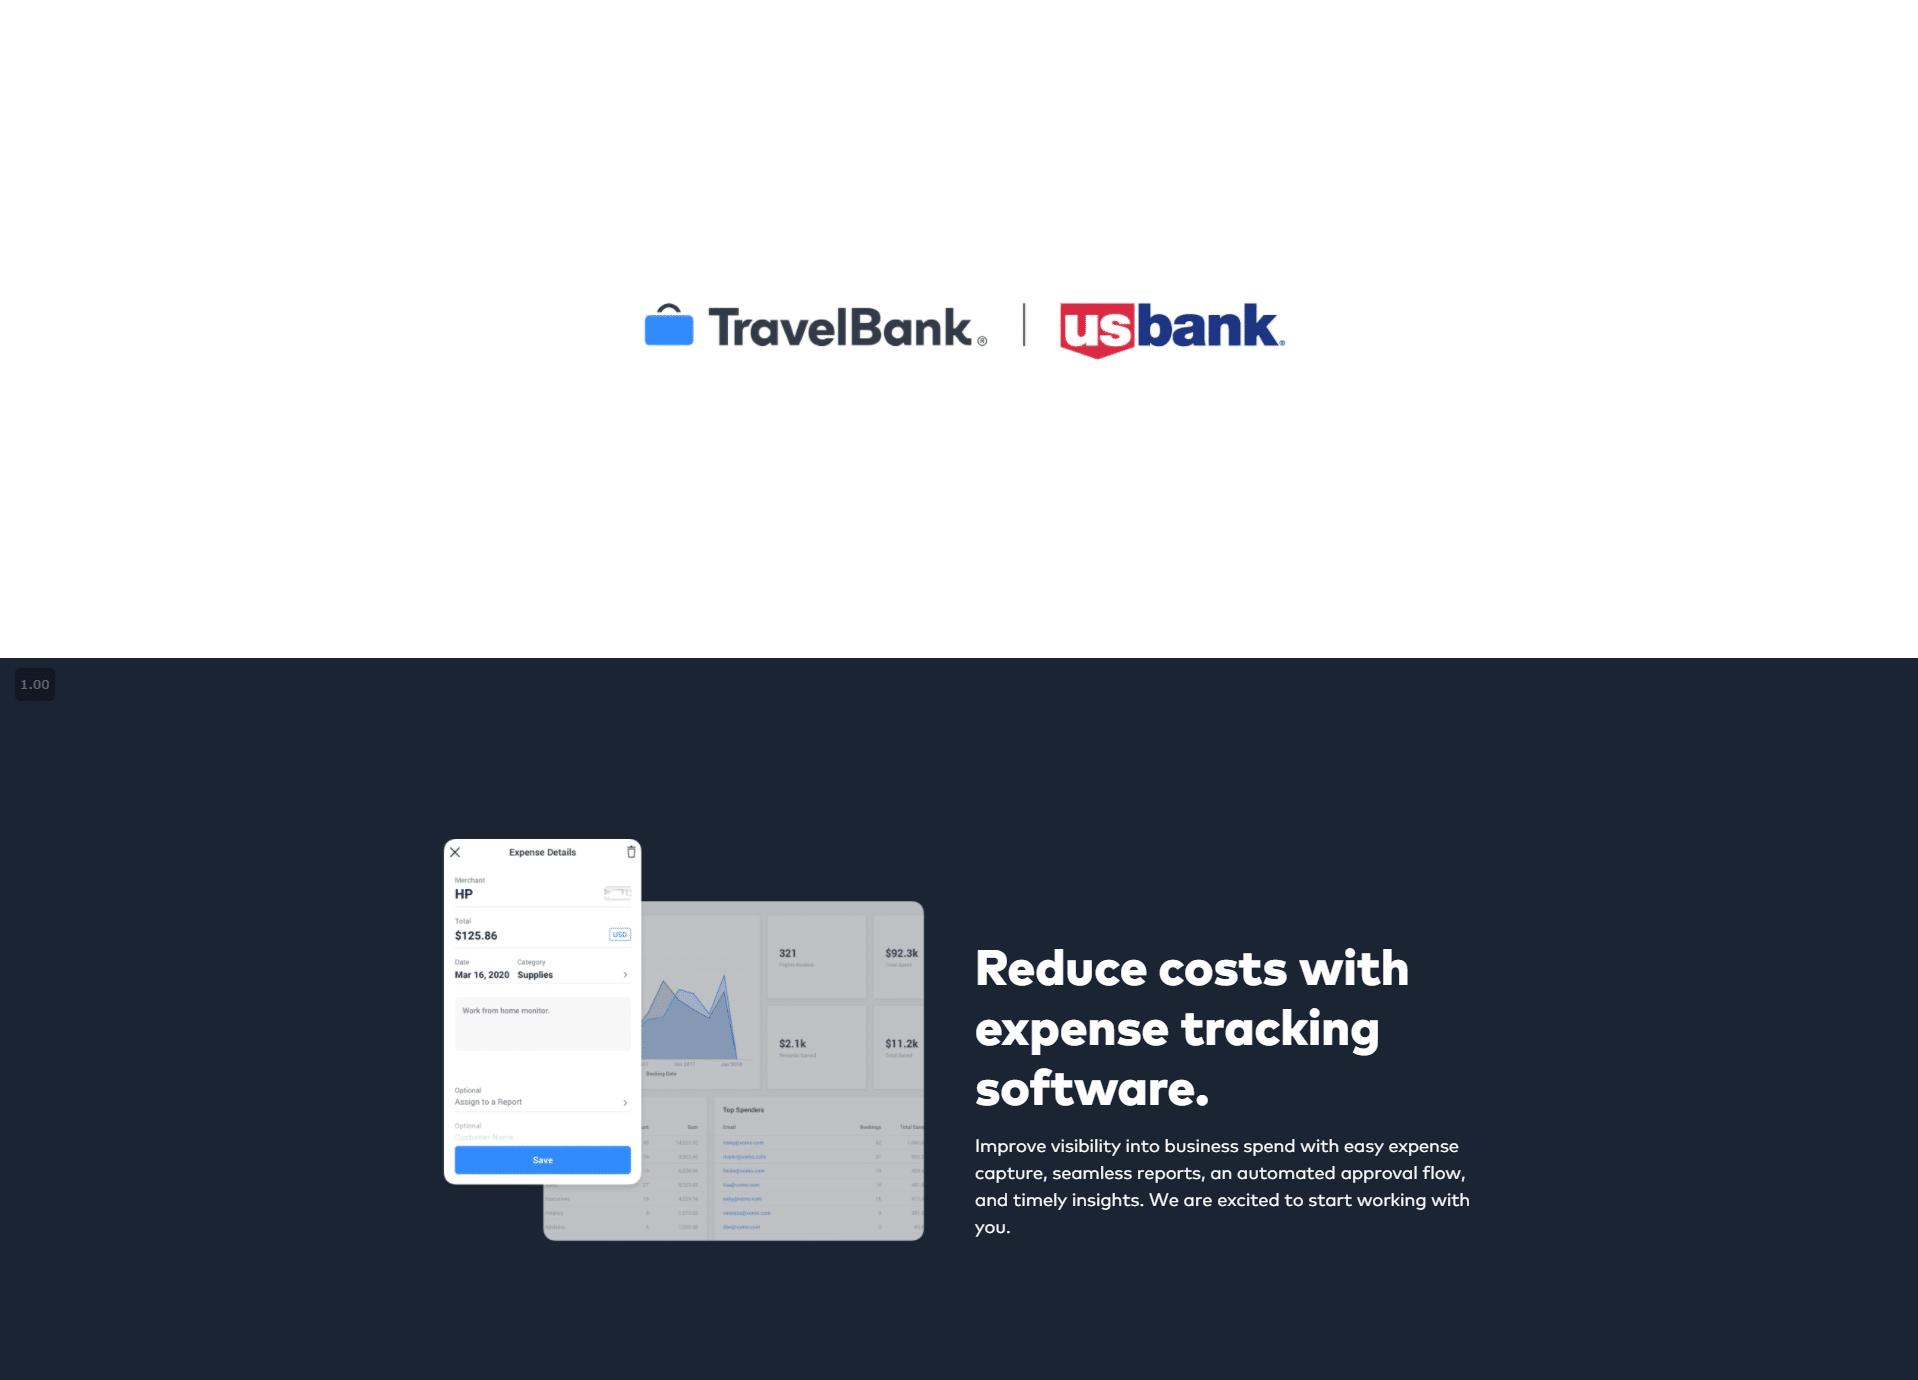 screencapture-docs-travelbank-TravelBank-Expense-Management-U-S-Bank-XfWsLYLSRSin-2021-03-22-16_10_14